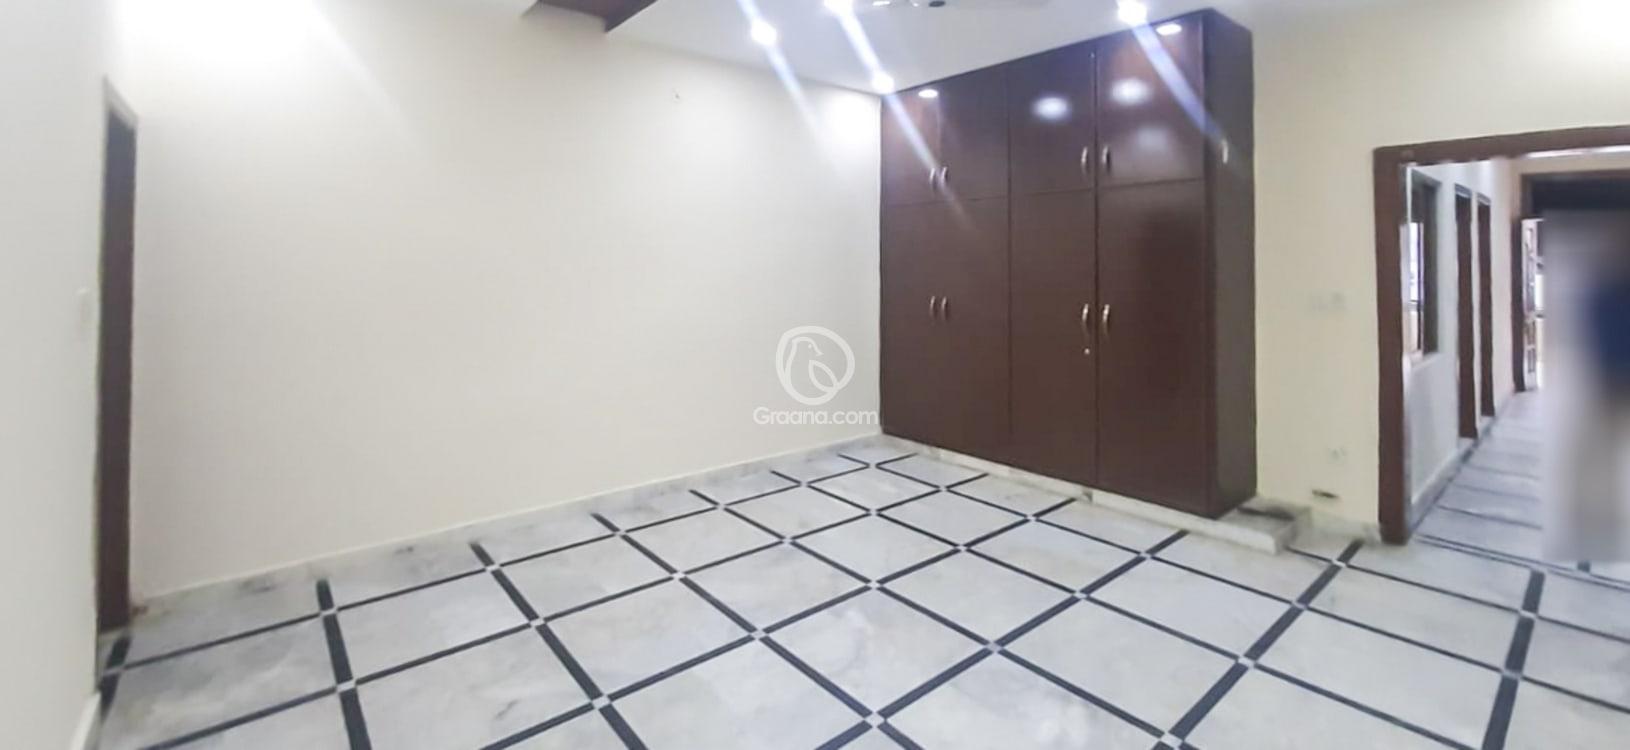 7 Marla House for Rent   Graana.com